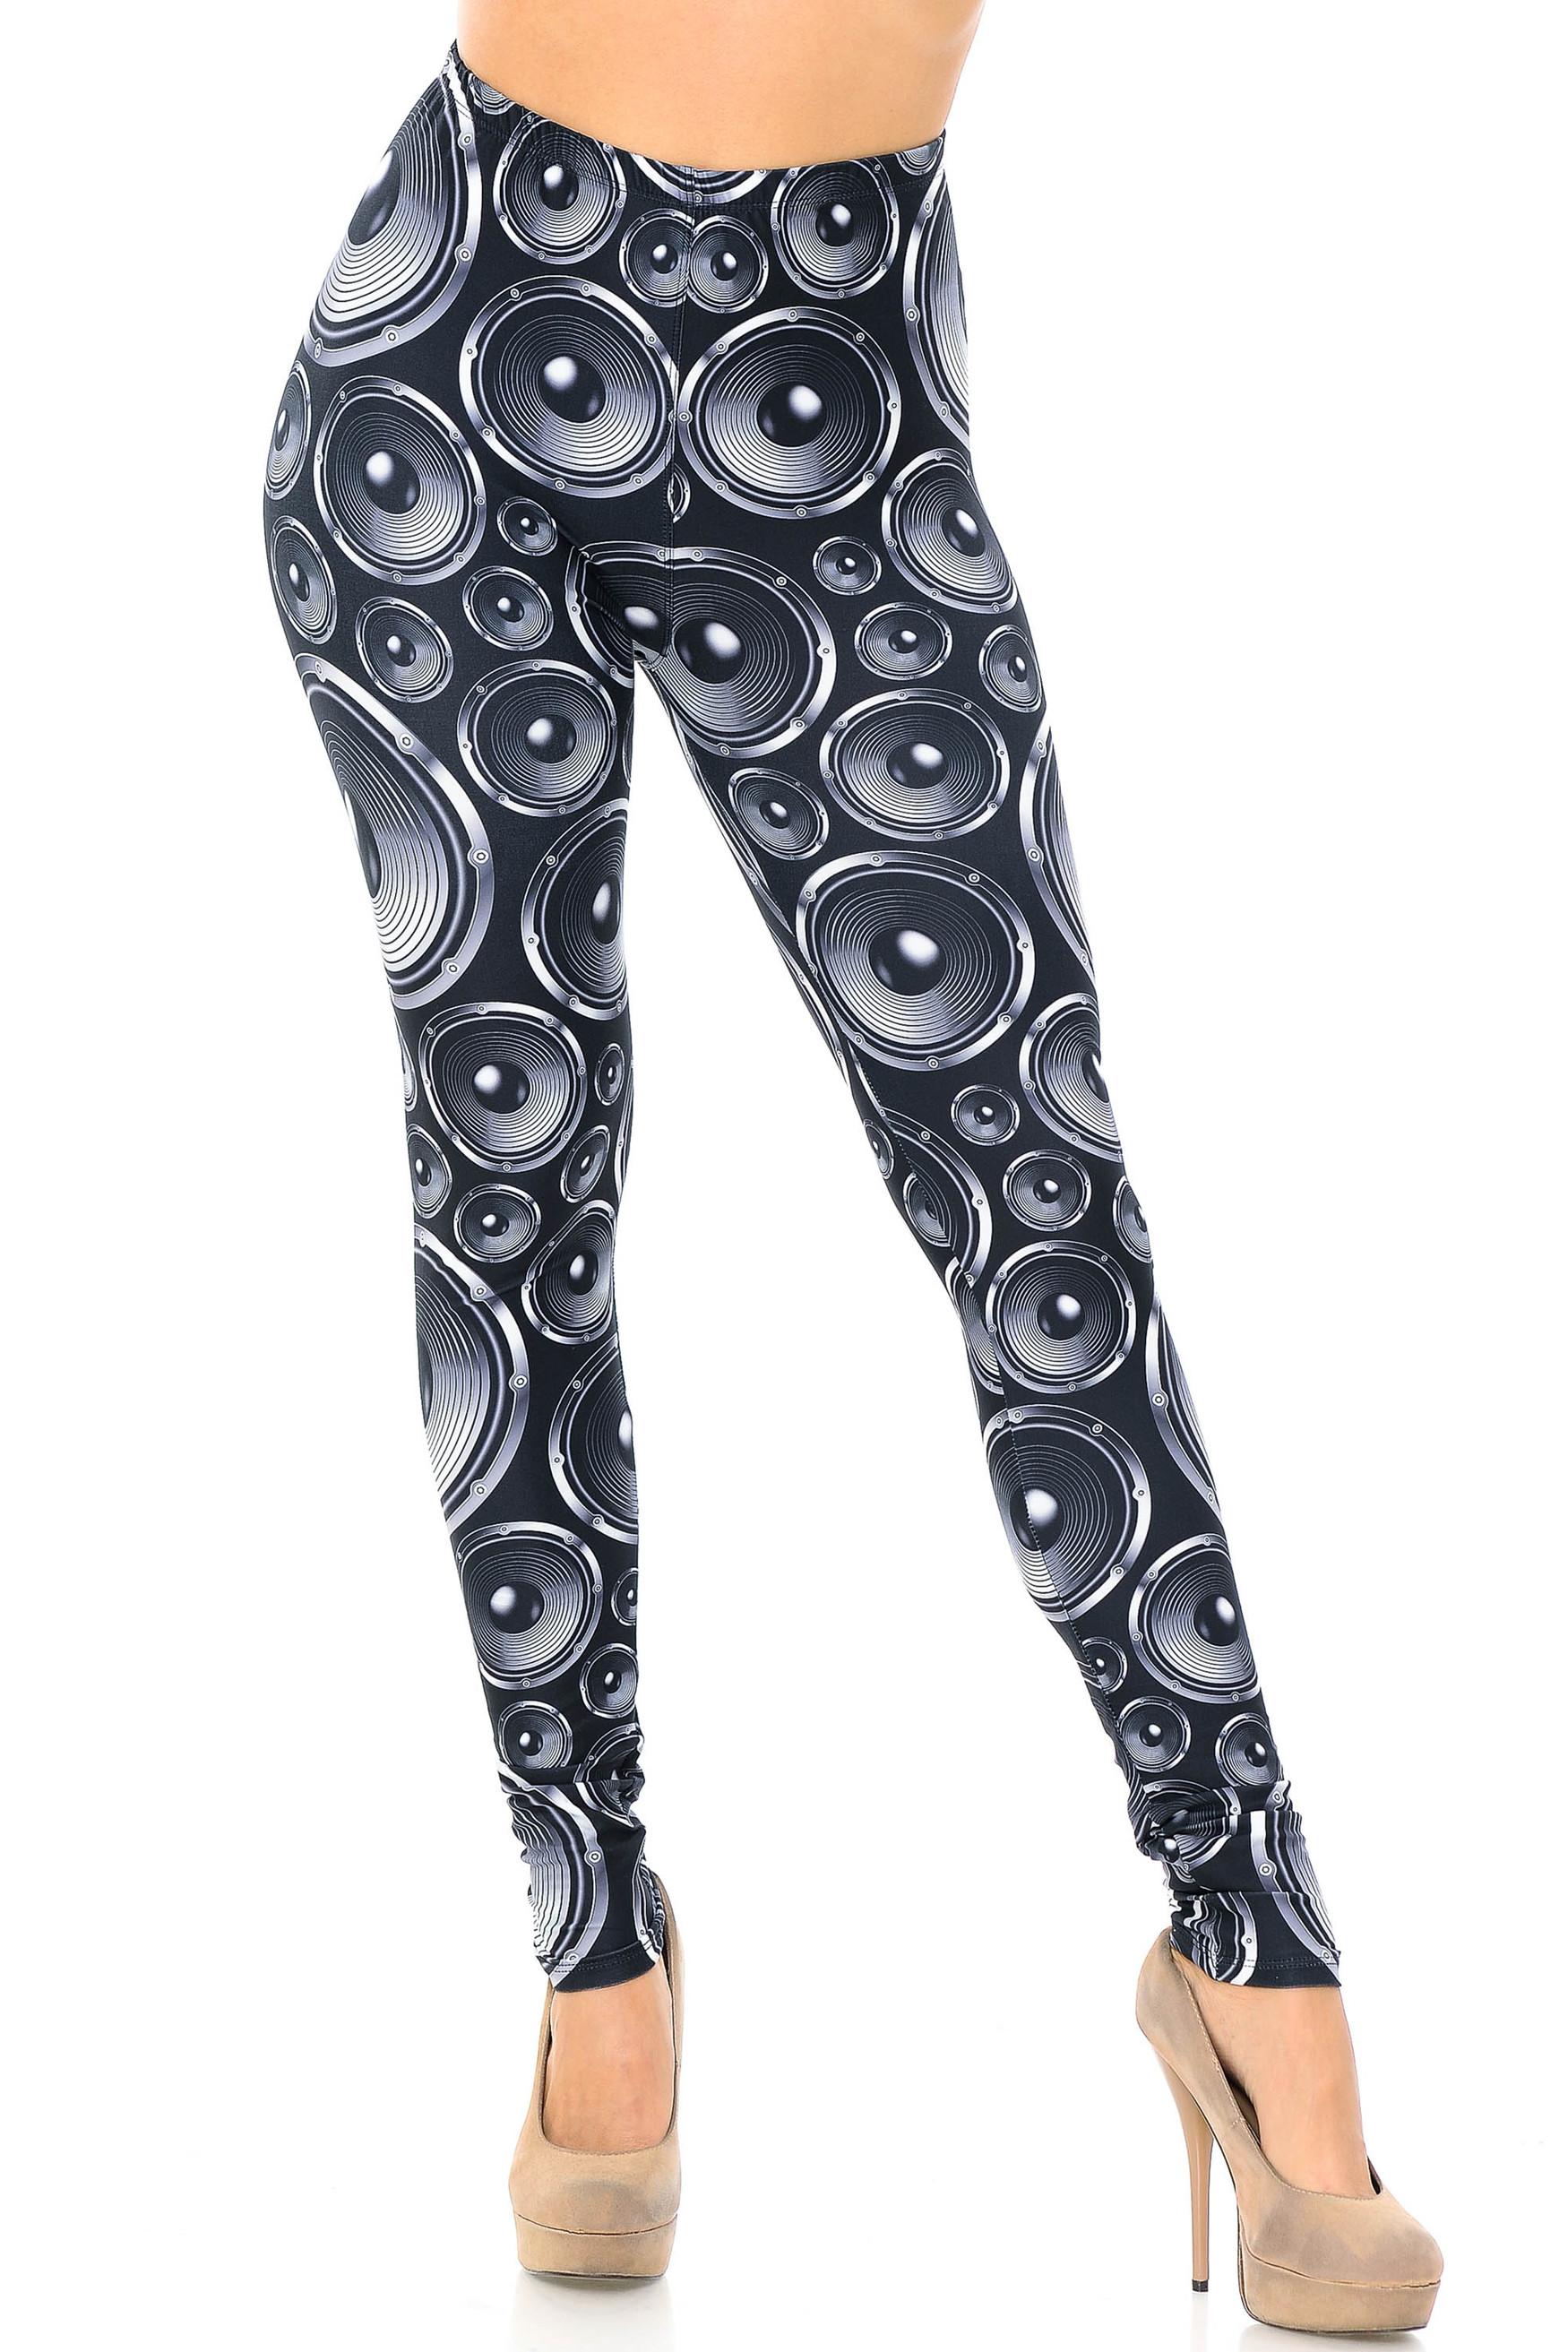 Creamy Soft Speaker Extra Plus Size Leggings - 3X-5X - USA Fashion™